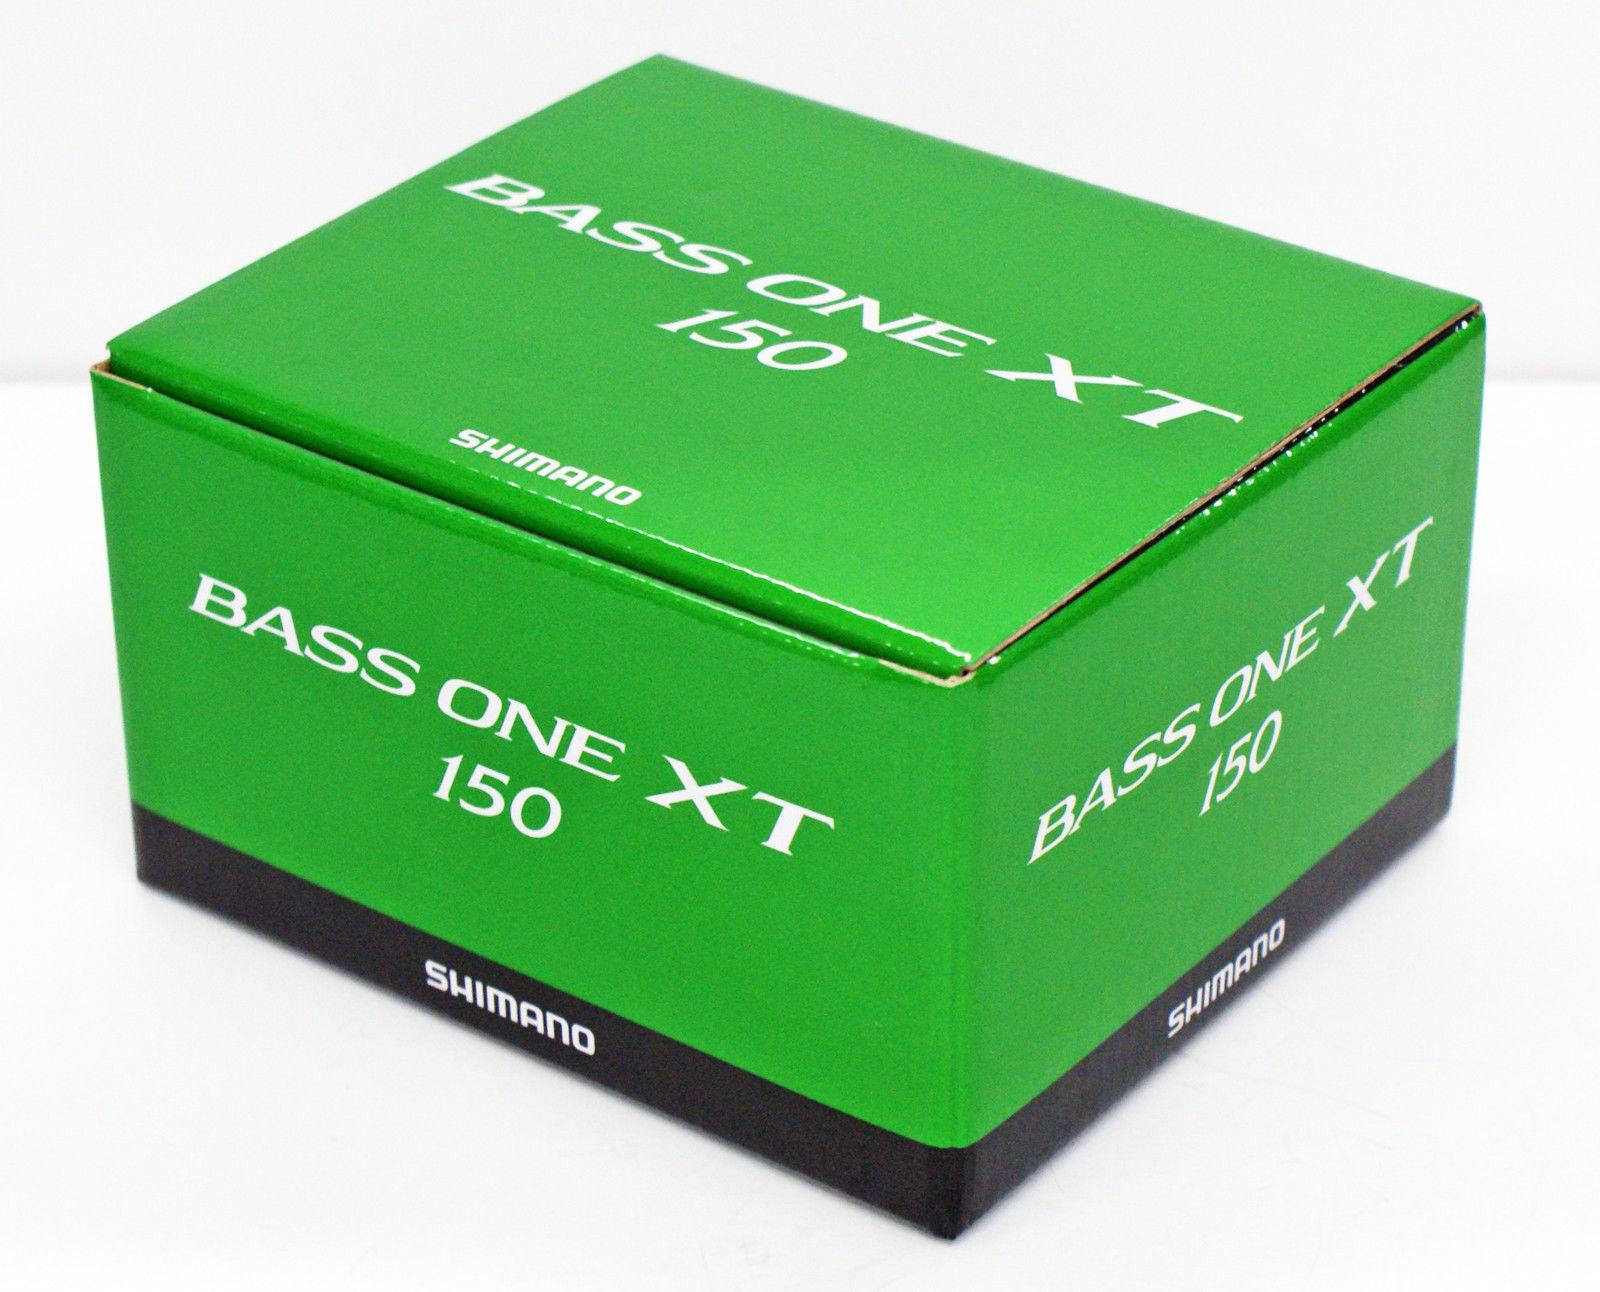 Shimano 17 Bass One XT 150 Right Baitcasting Reel 4969363037312